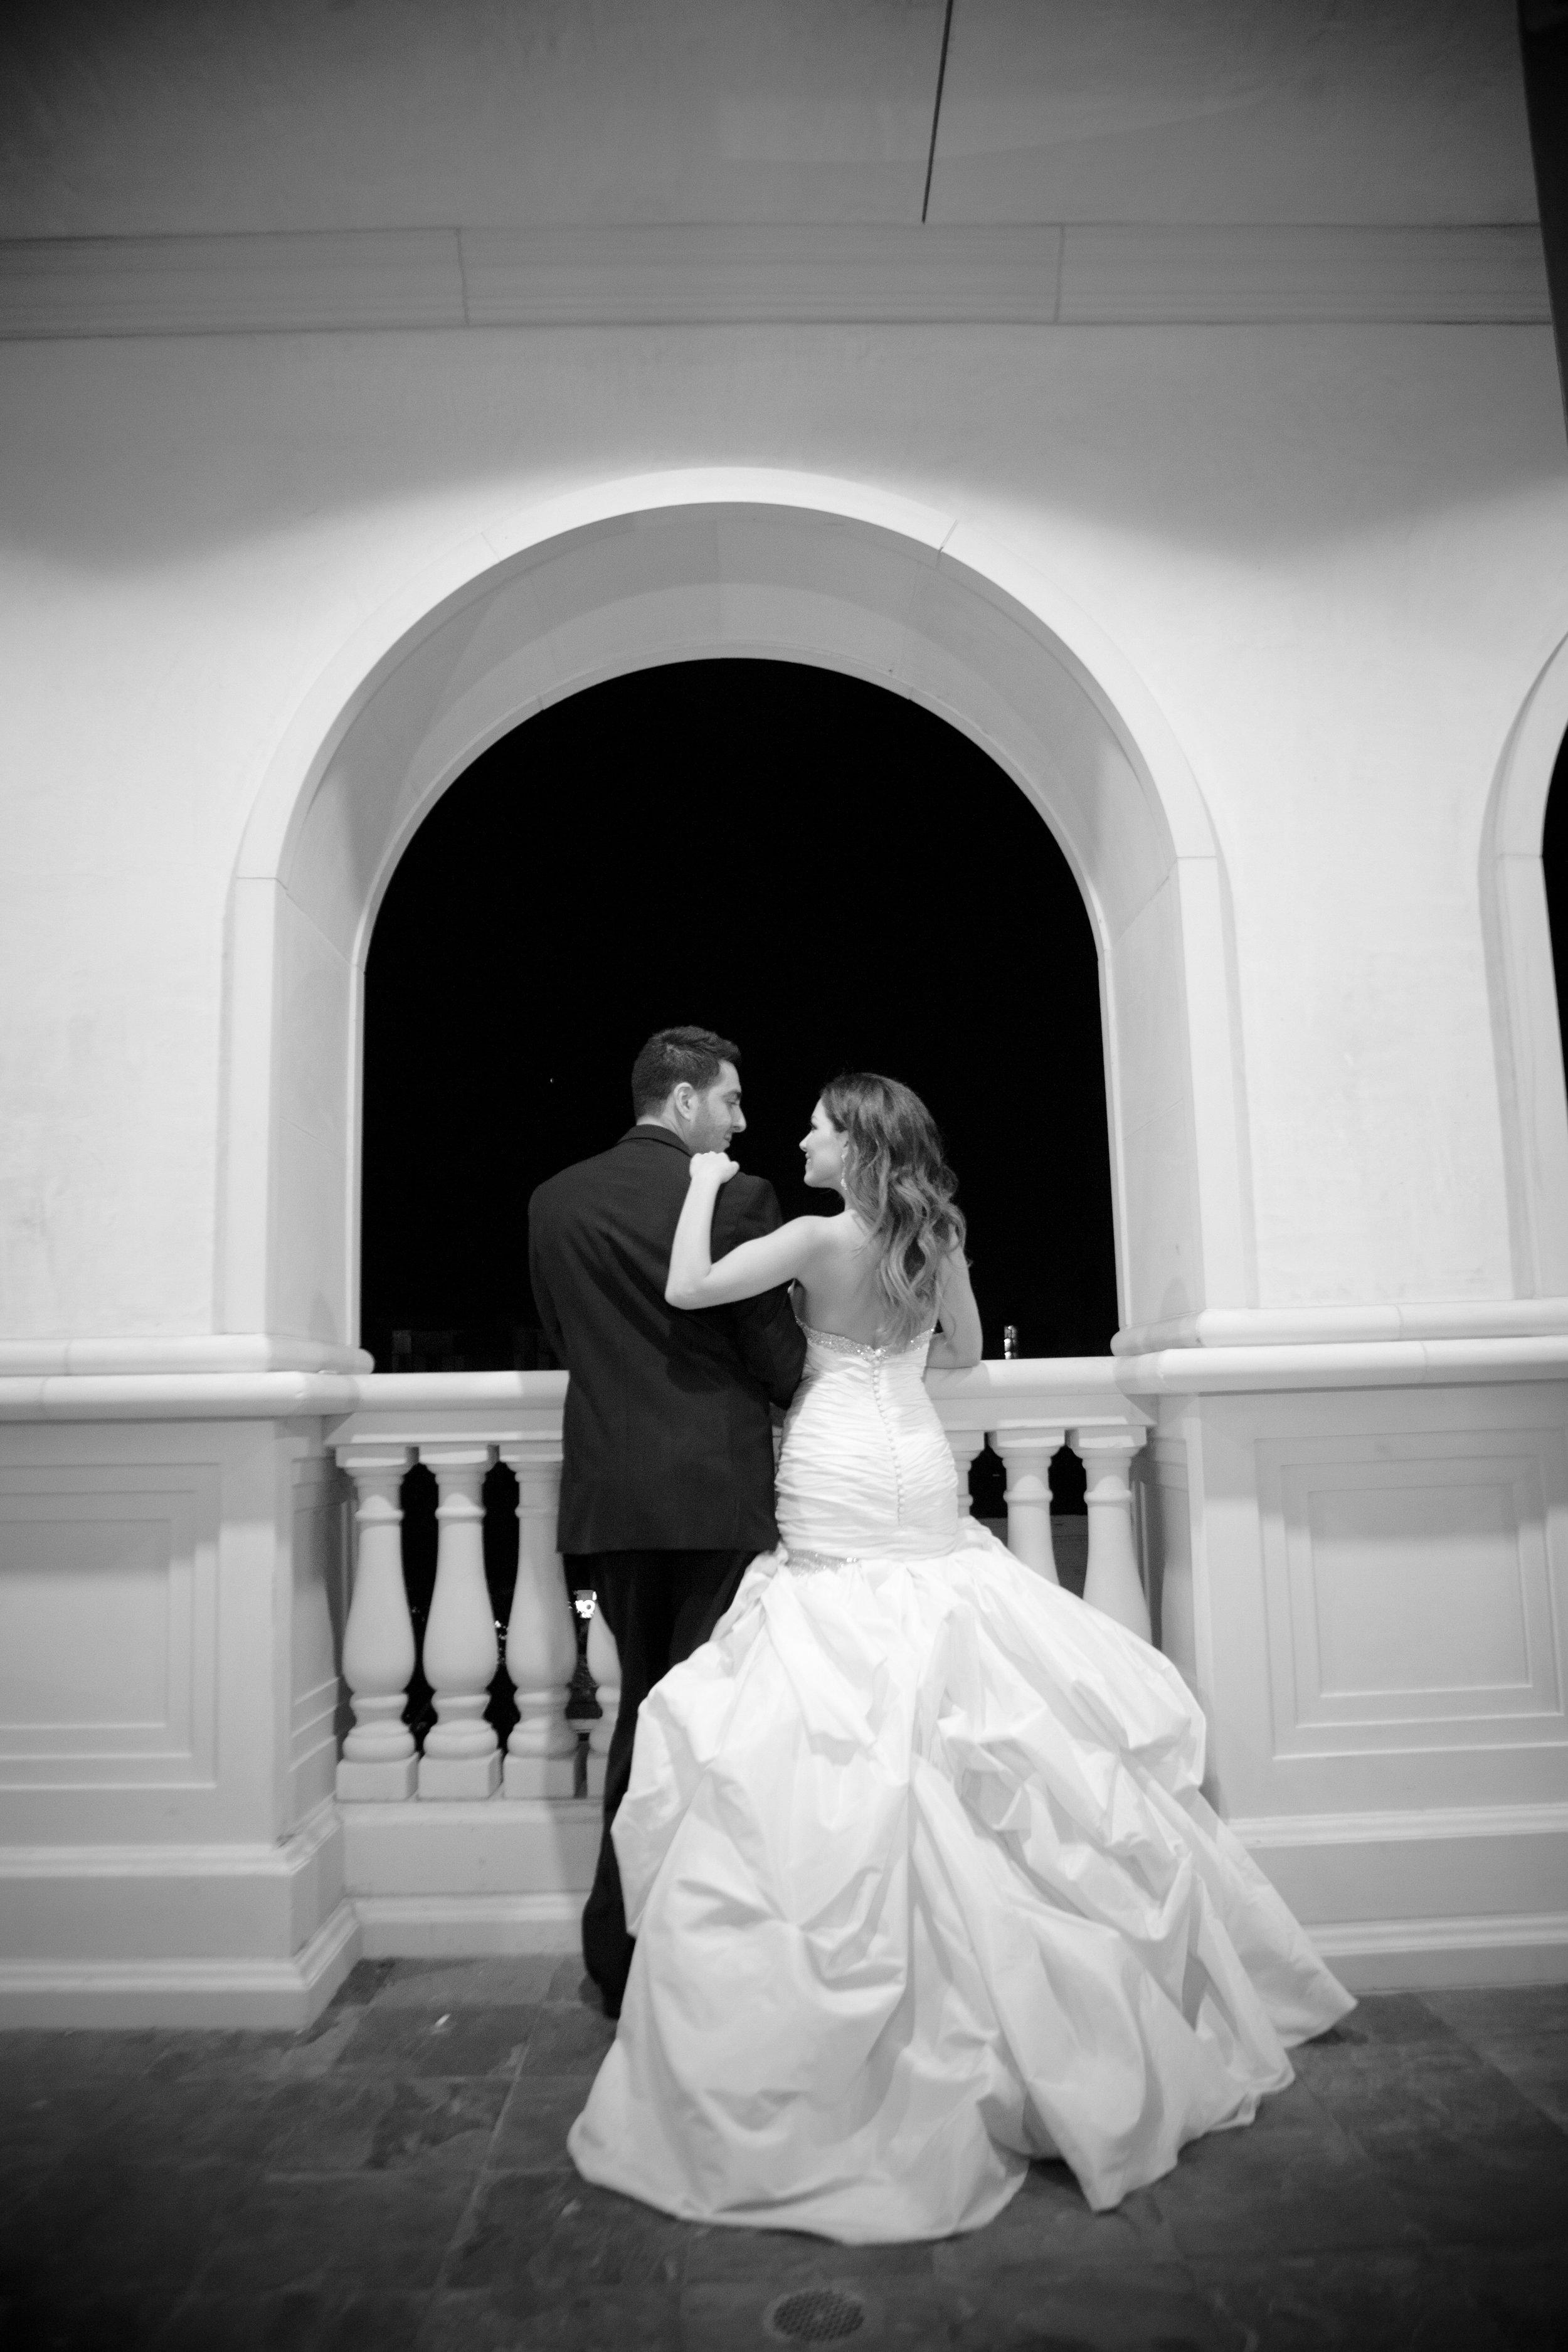 Bride in mermaid wedding dress with groom on wedding day